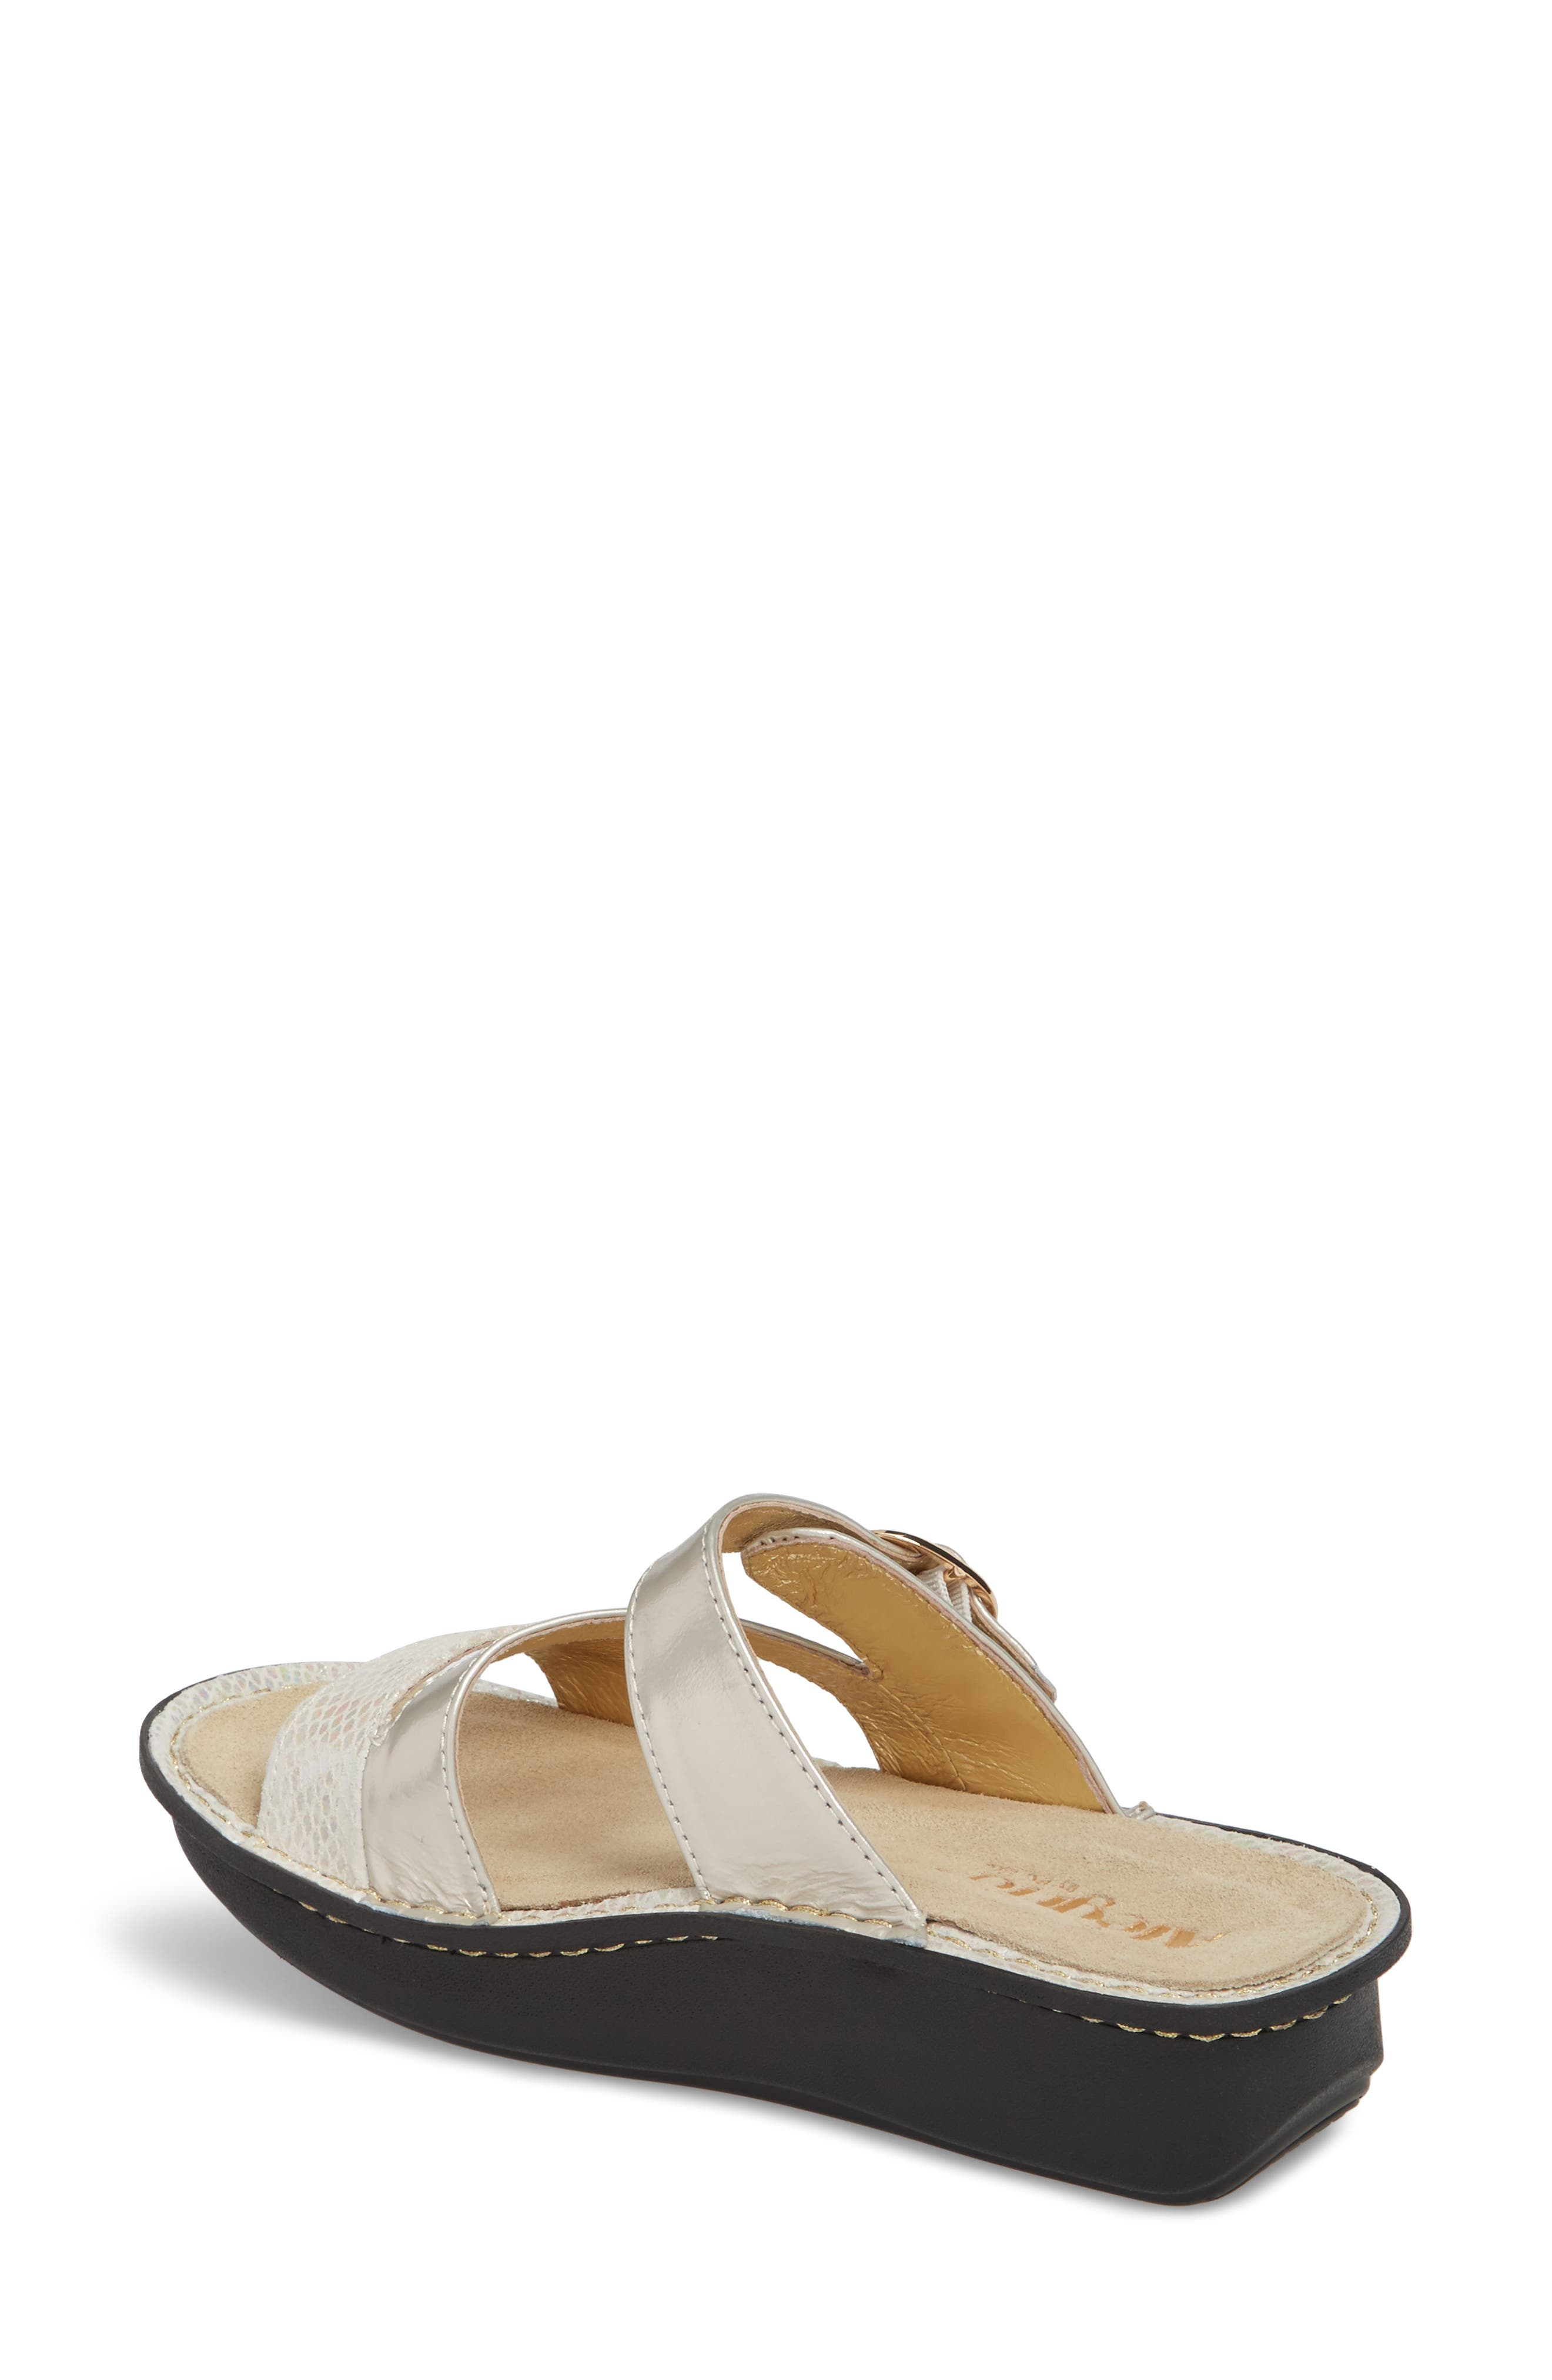 'Colette' Platform Sandal,                             Alternate thumbnail 17, color,